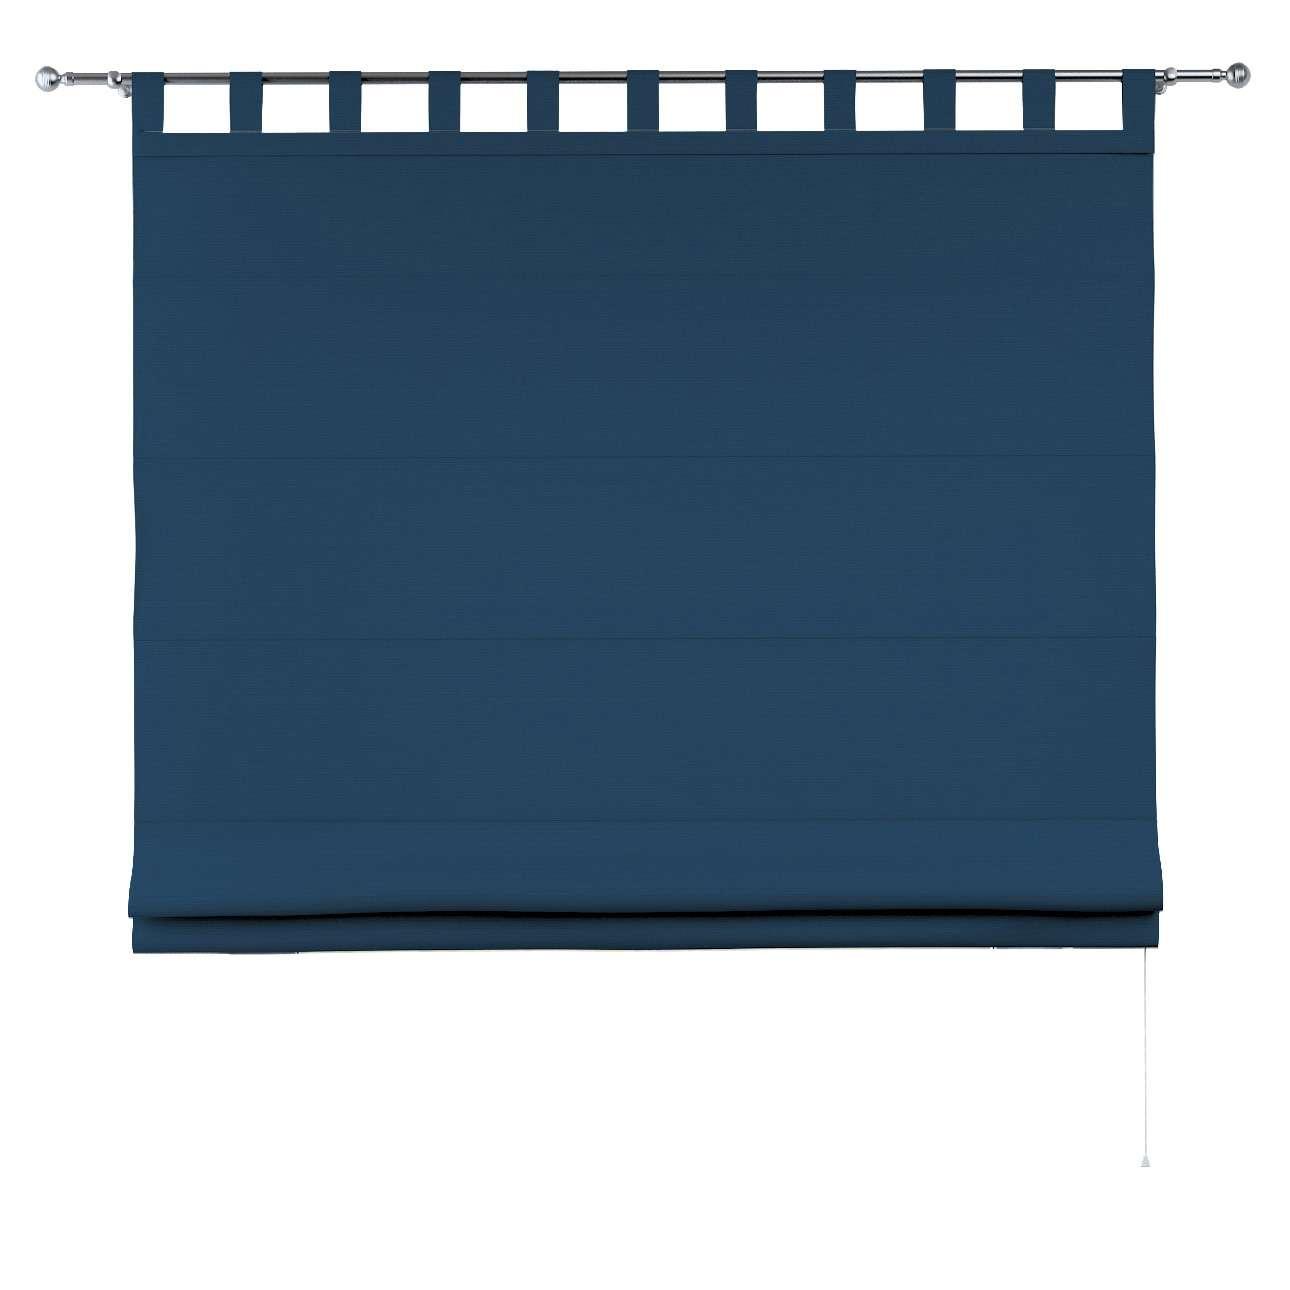 Rímska roleta Verona 80 x 170 cm V kolekcii Cotton Panama, tkanina: 702-30